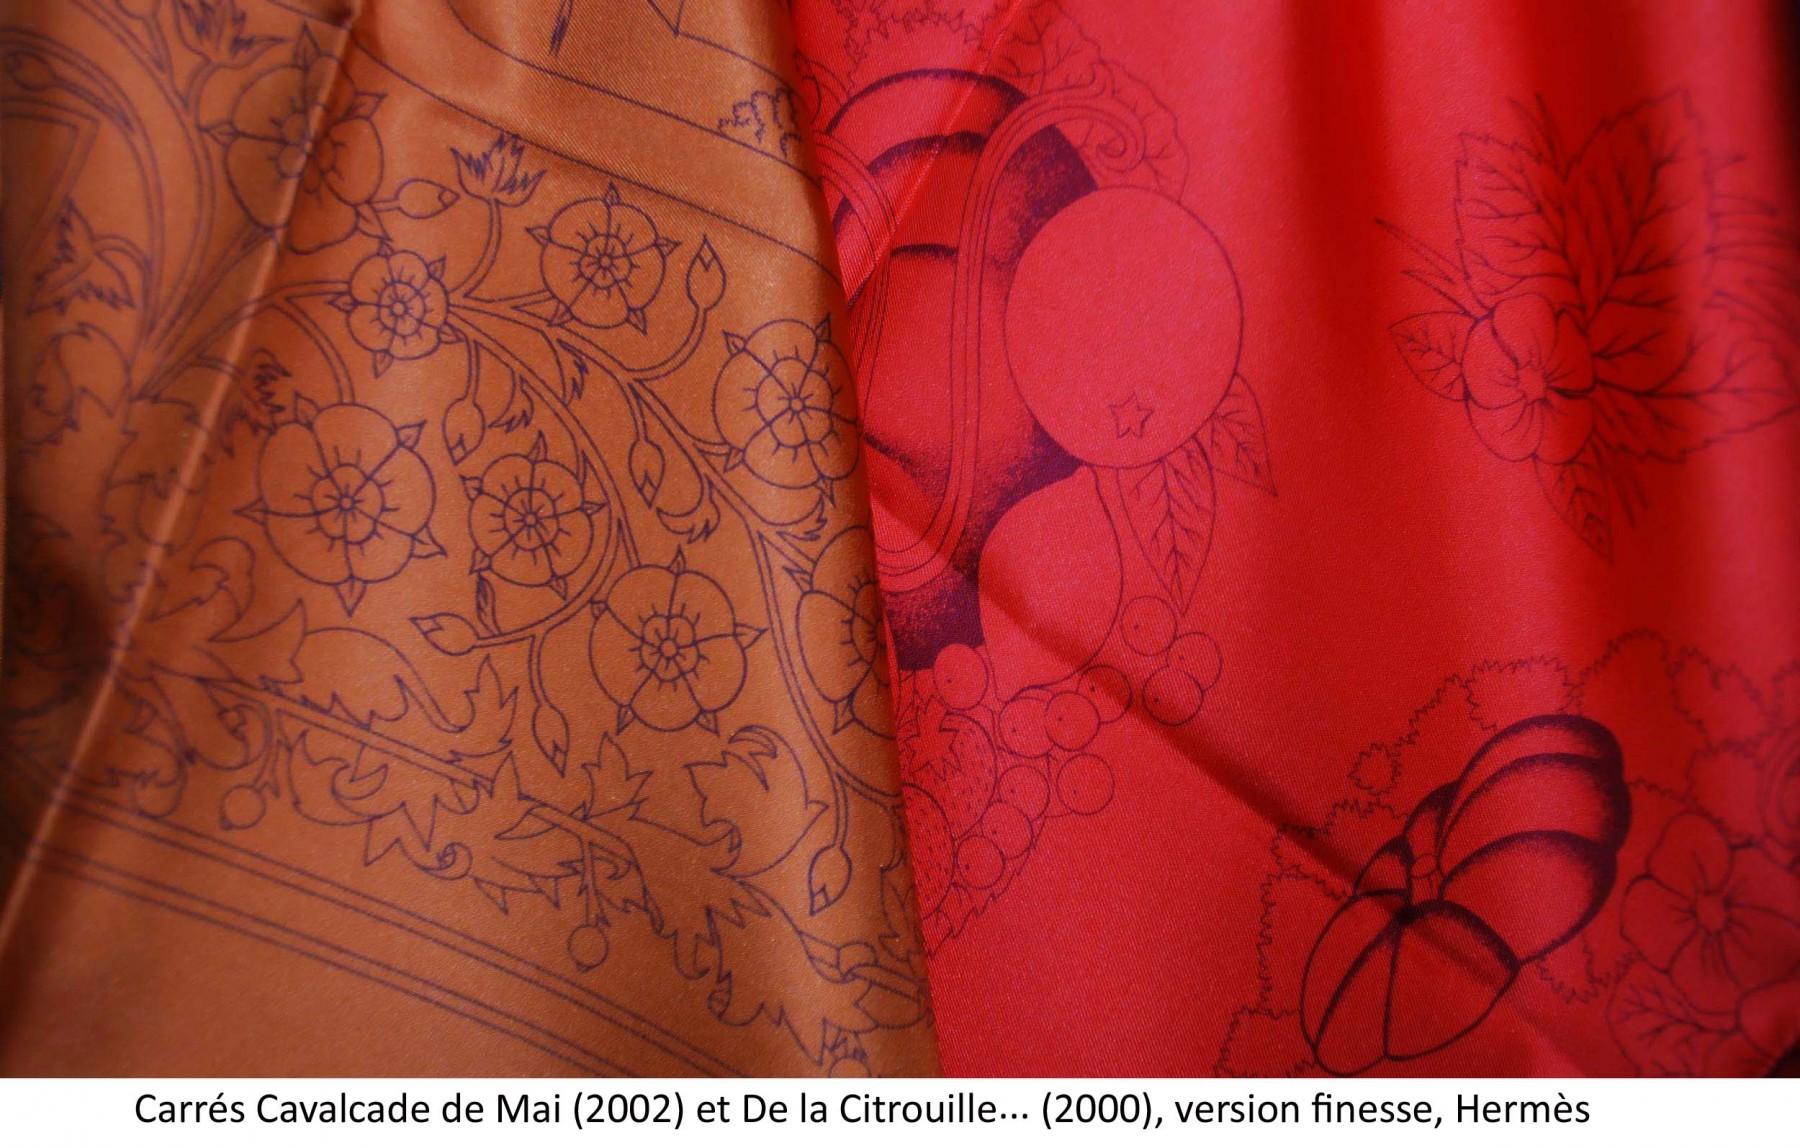 carres_citrouille_cavalcade_details_txt